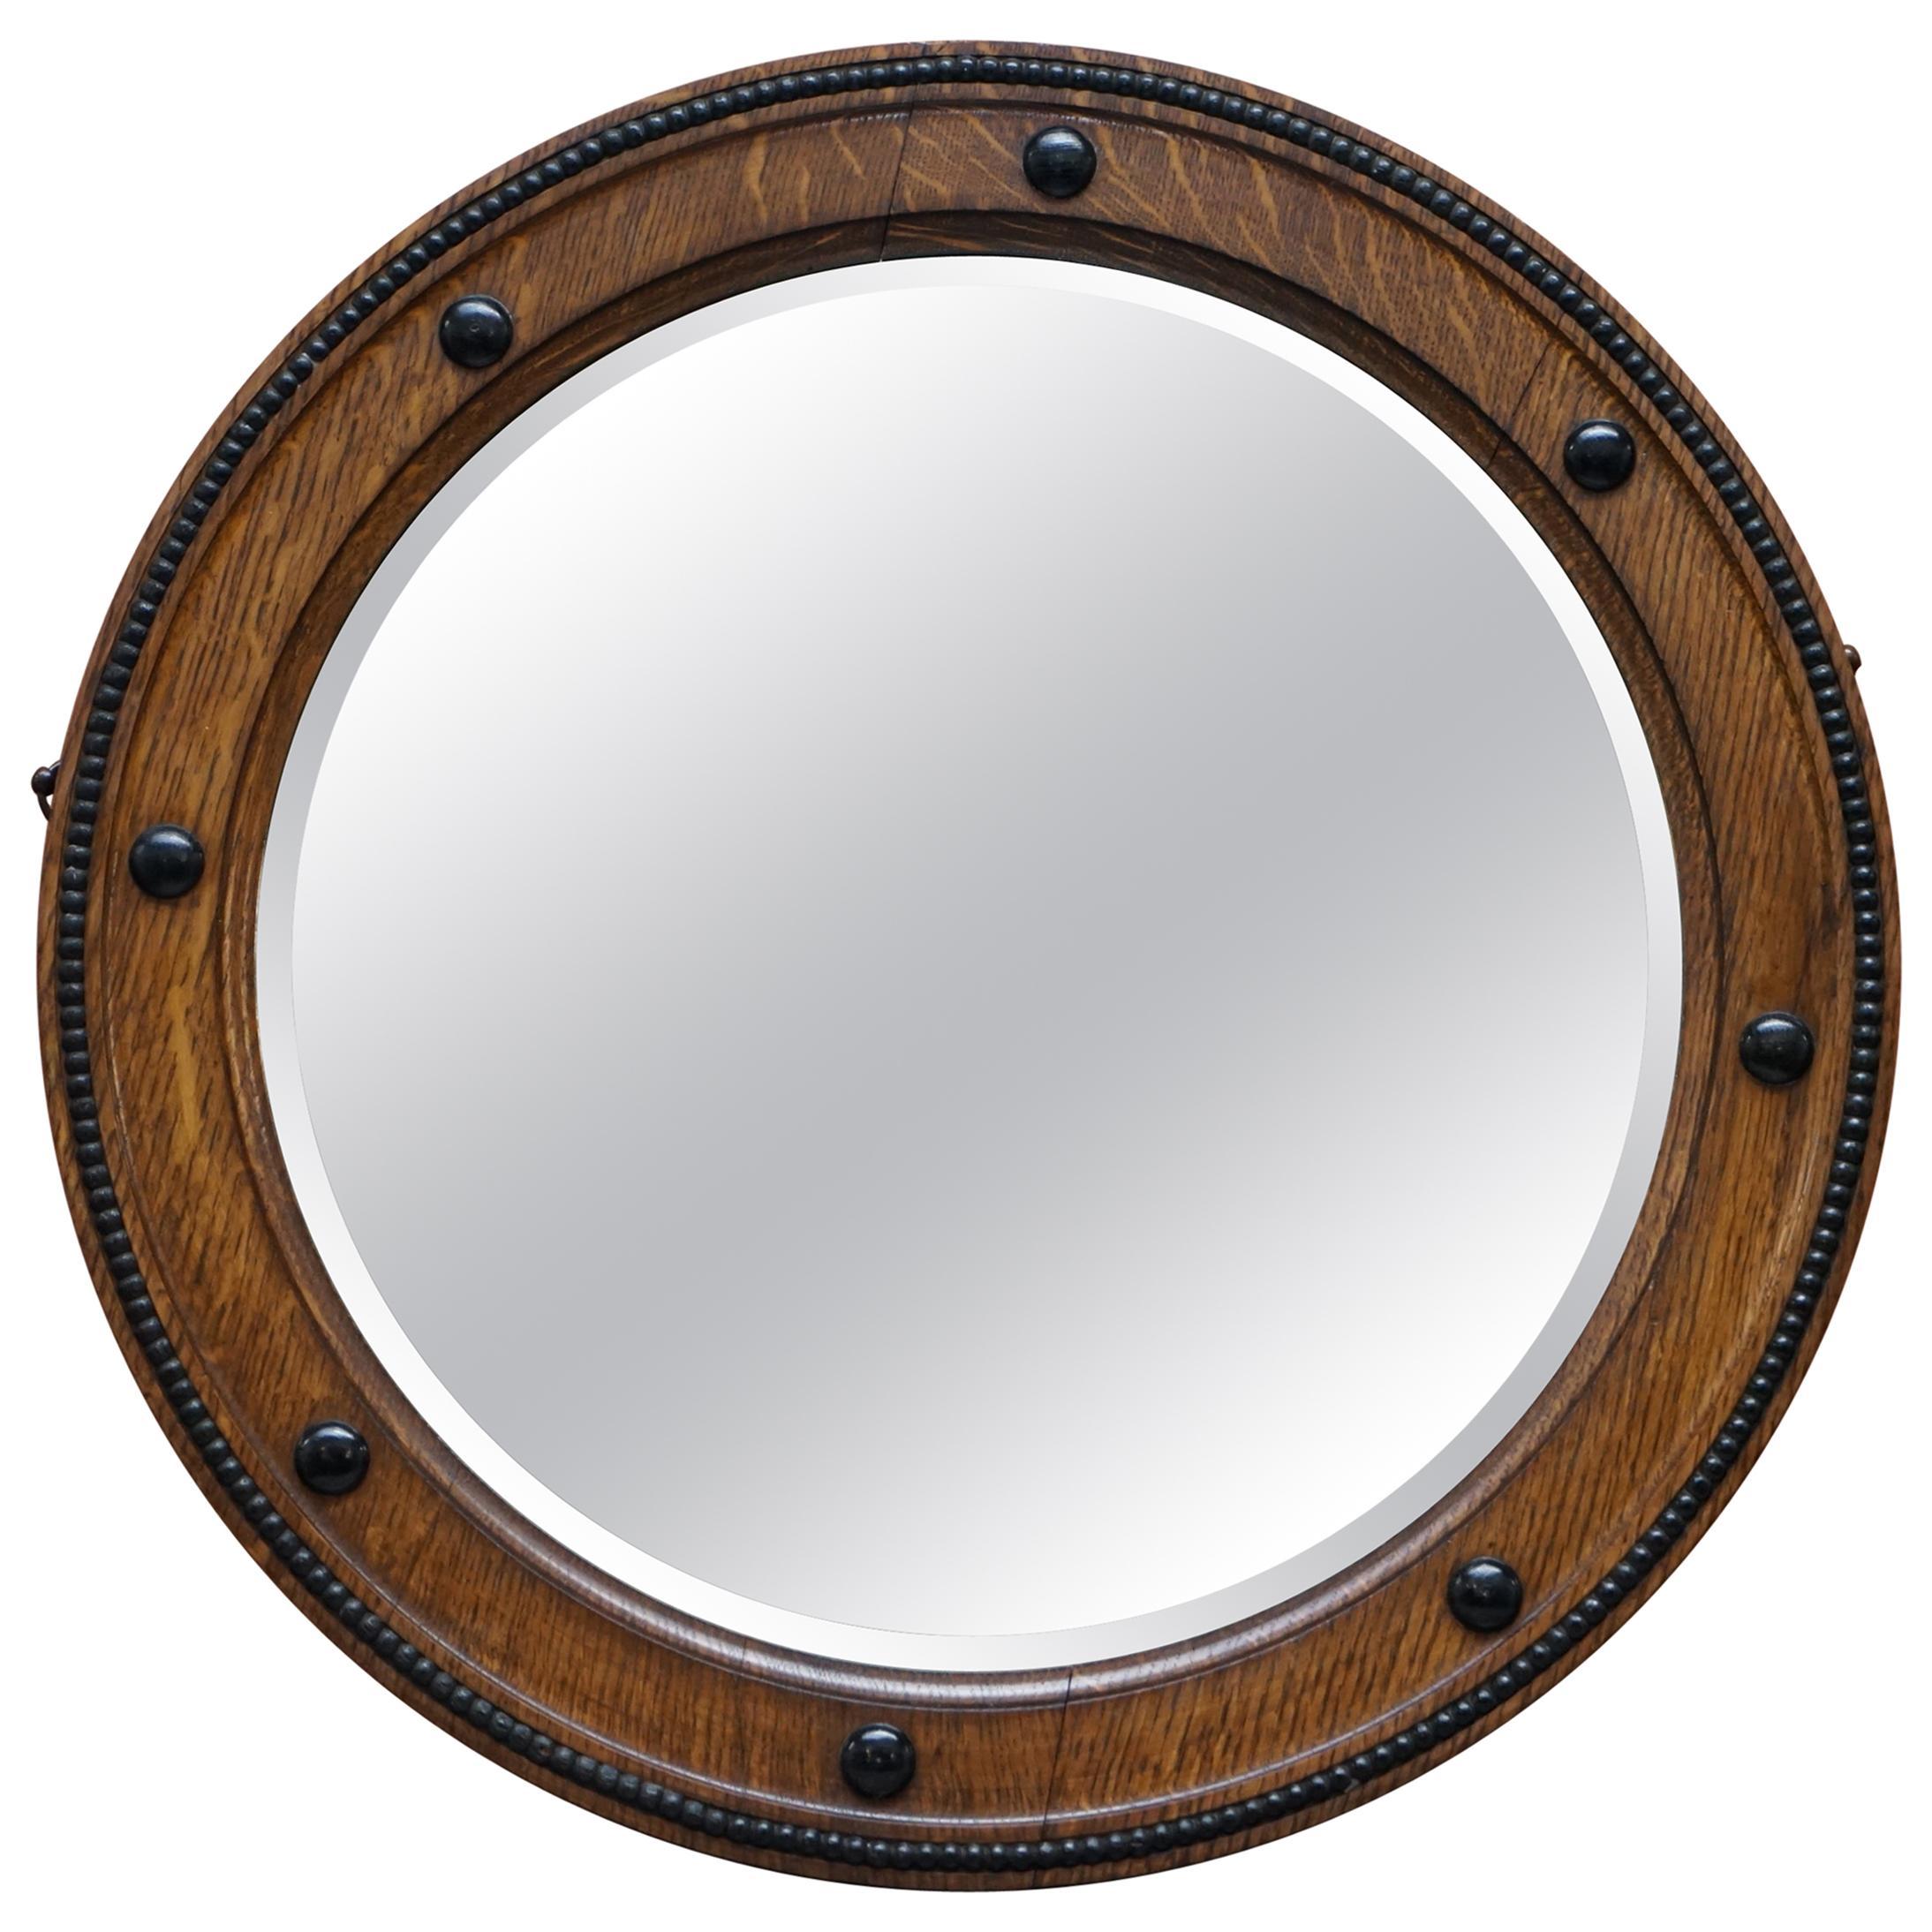 Stunning 1920, 1930s Art Deco Round Oak Framed Wall Mirror Stunning Patina